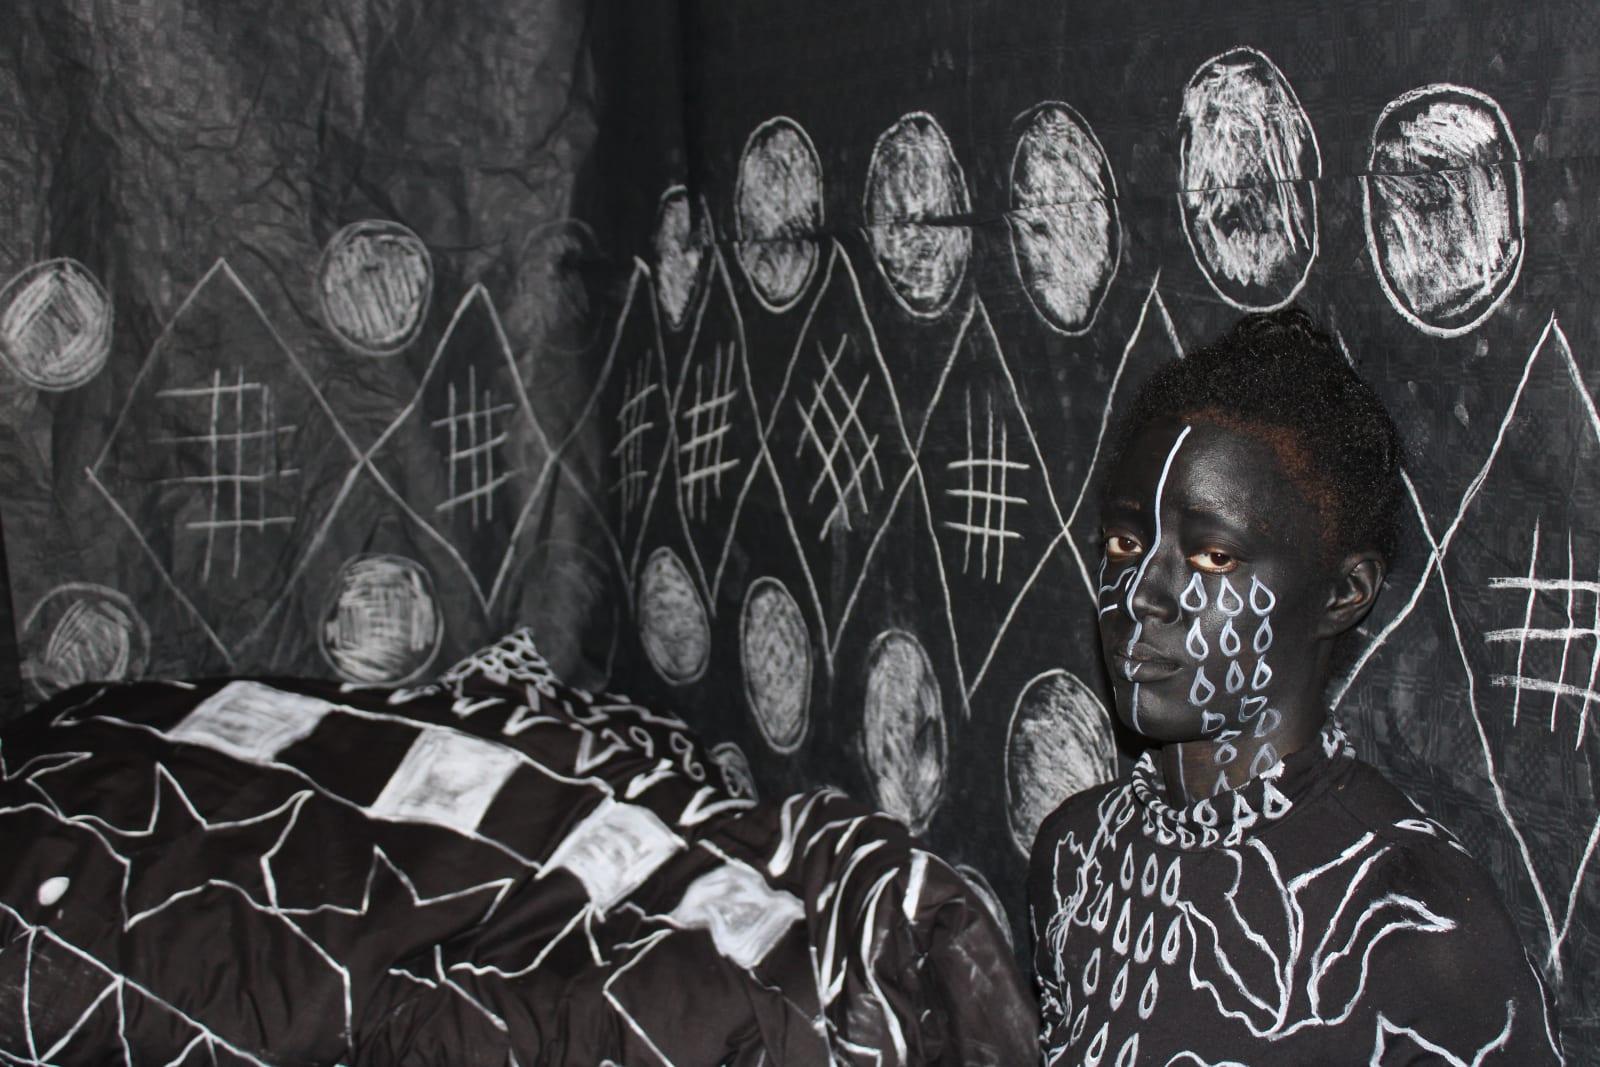 Abi Ola, Patterns in my bedroom 1, 2021